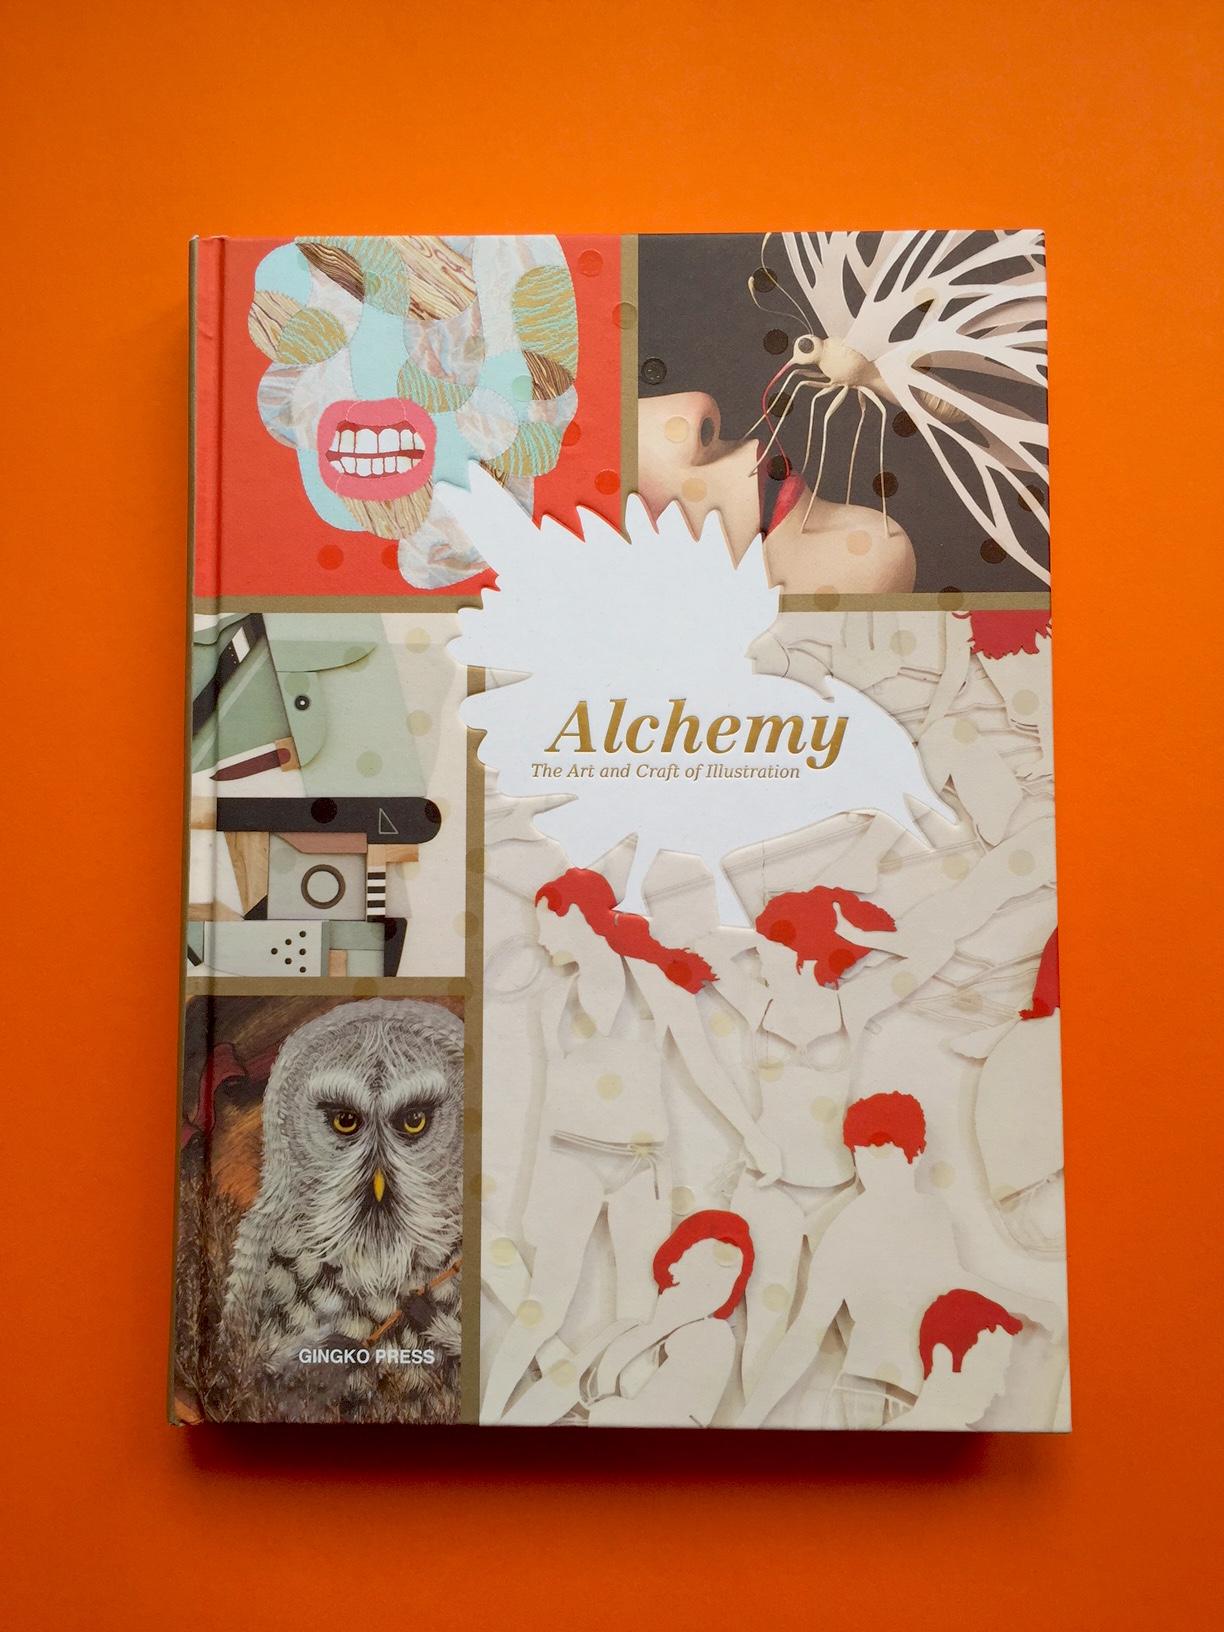 BI_160906_alchemy_cover_foto_hoch